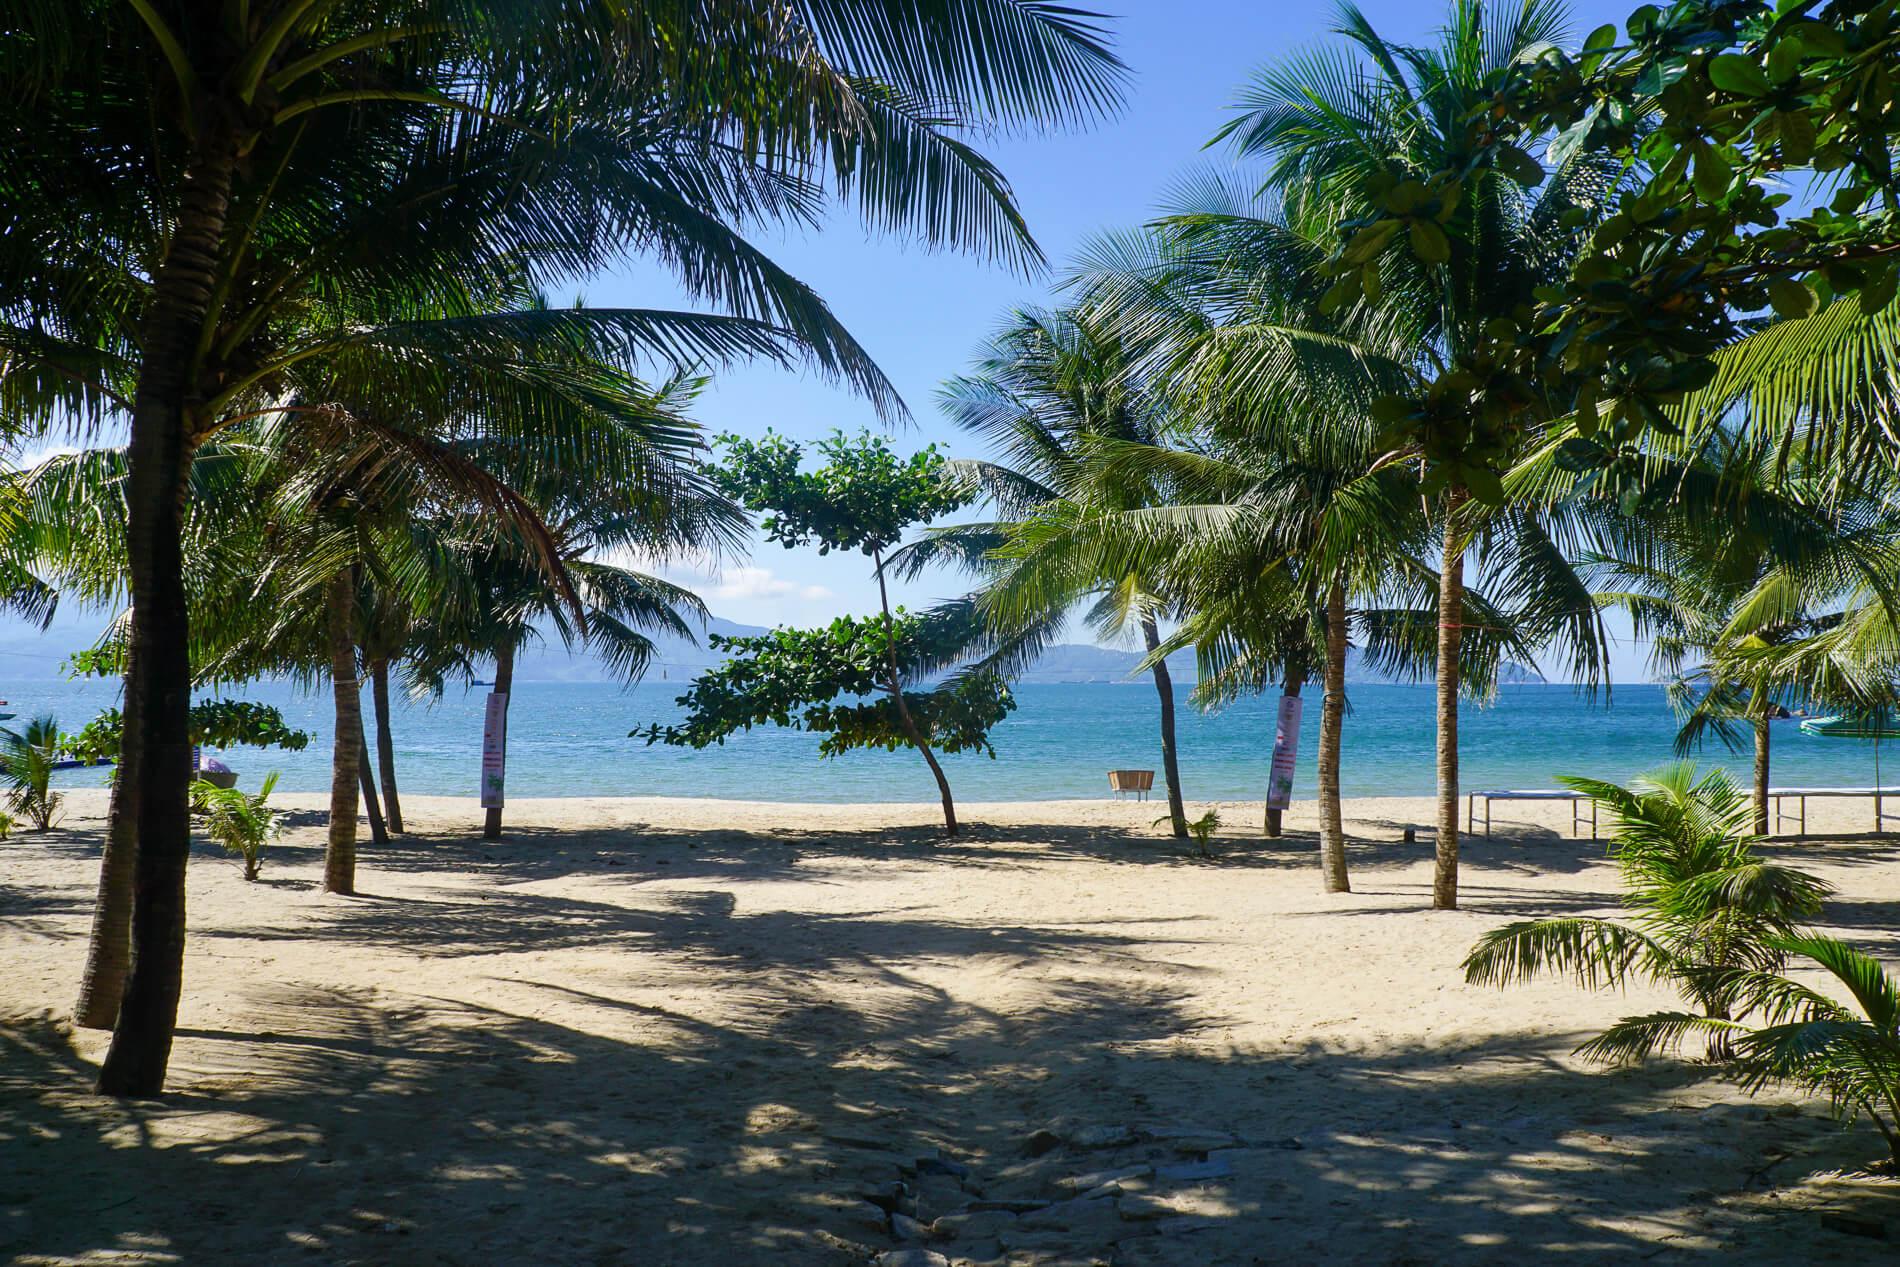 Palm trees line a stretch of secluded beach near Da Nang